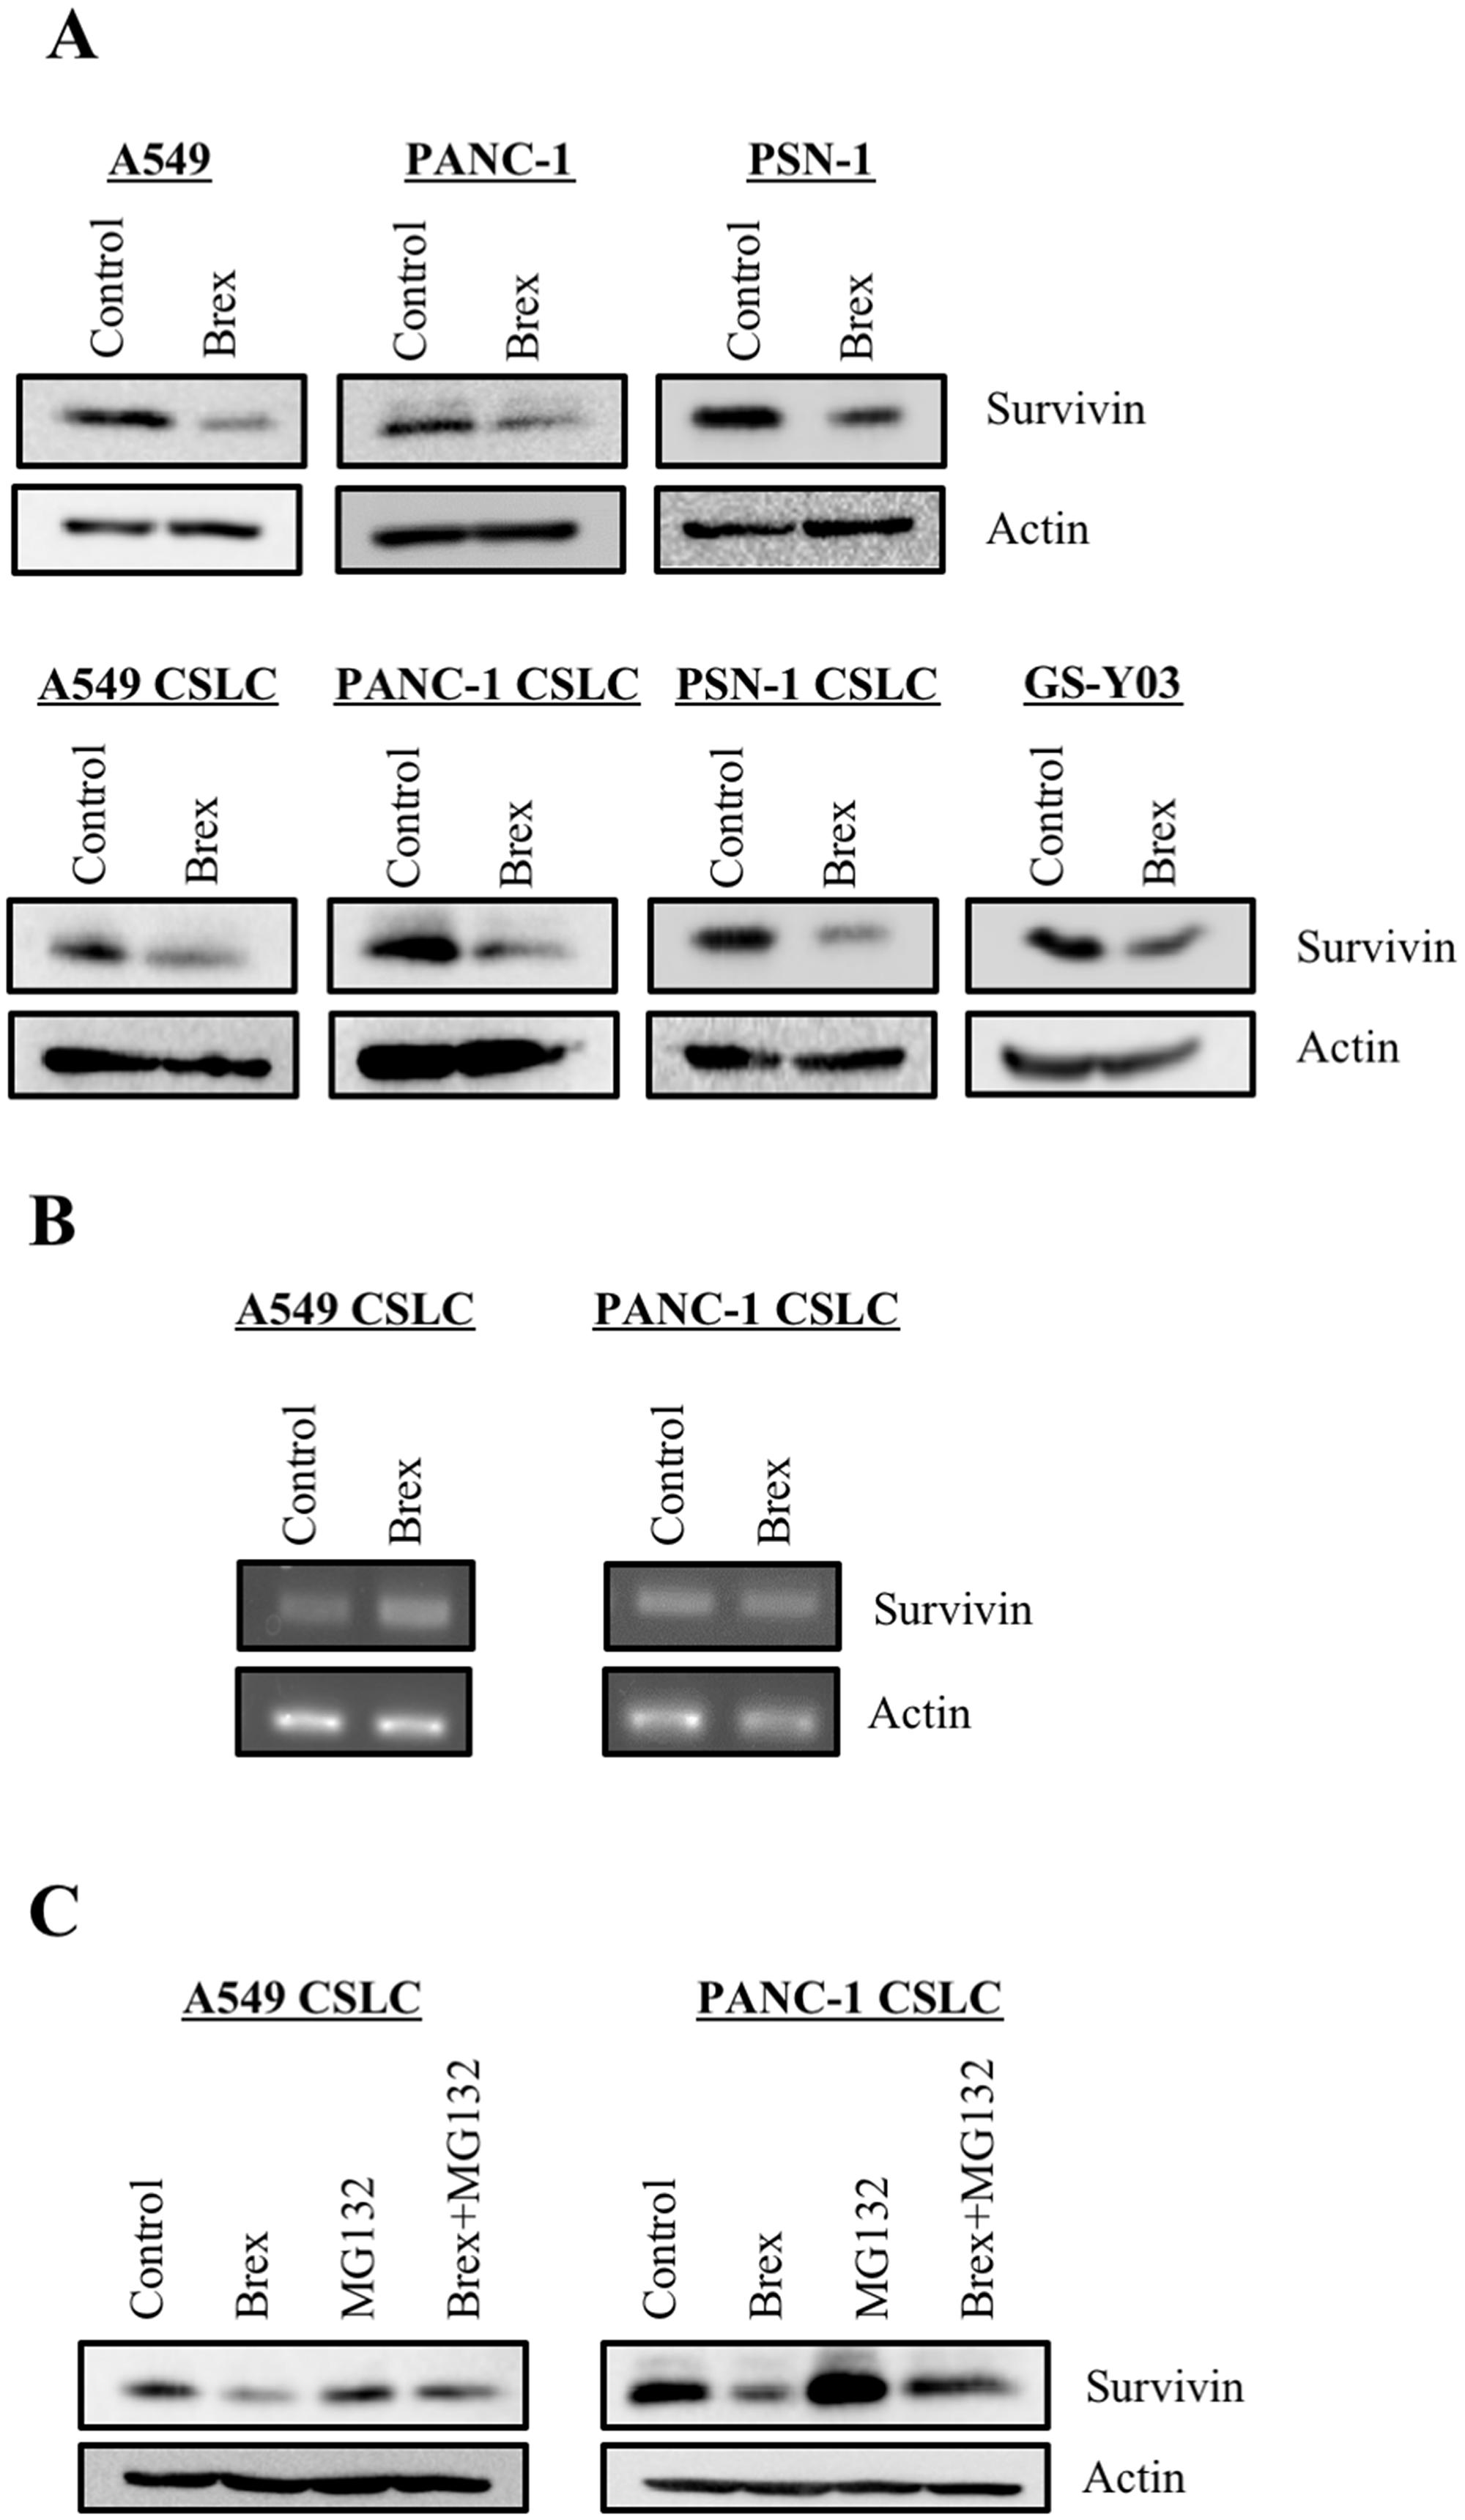 Brexpiprazole reduces the expression of survivin.